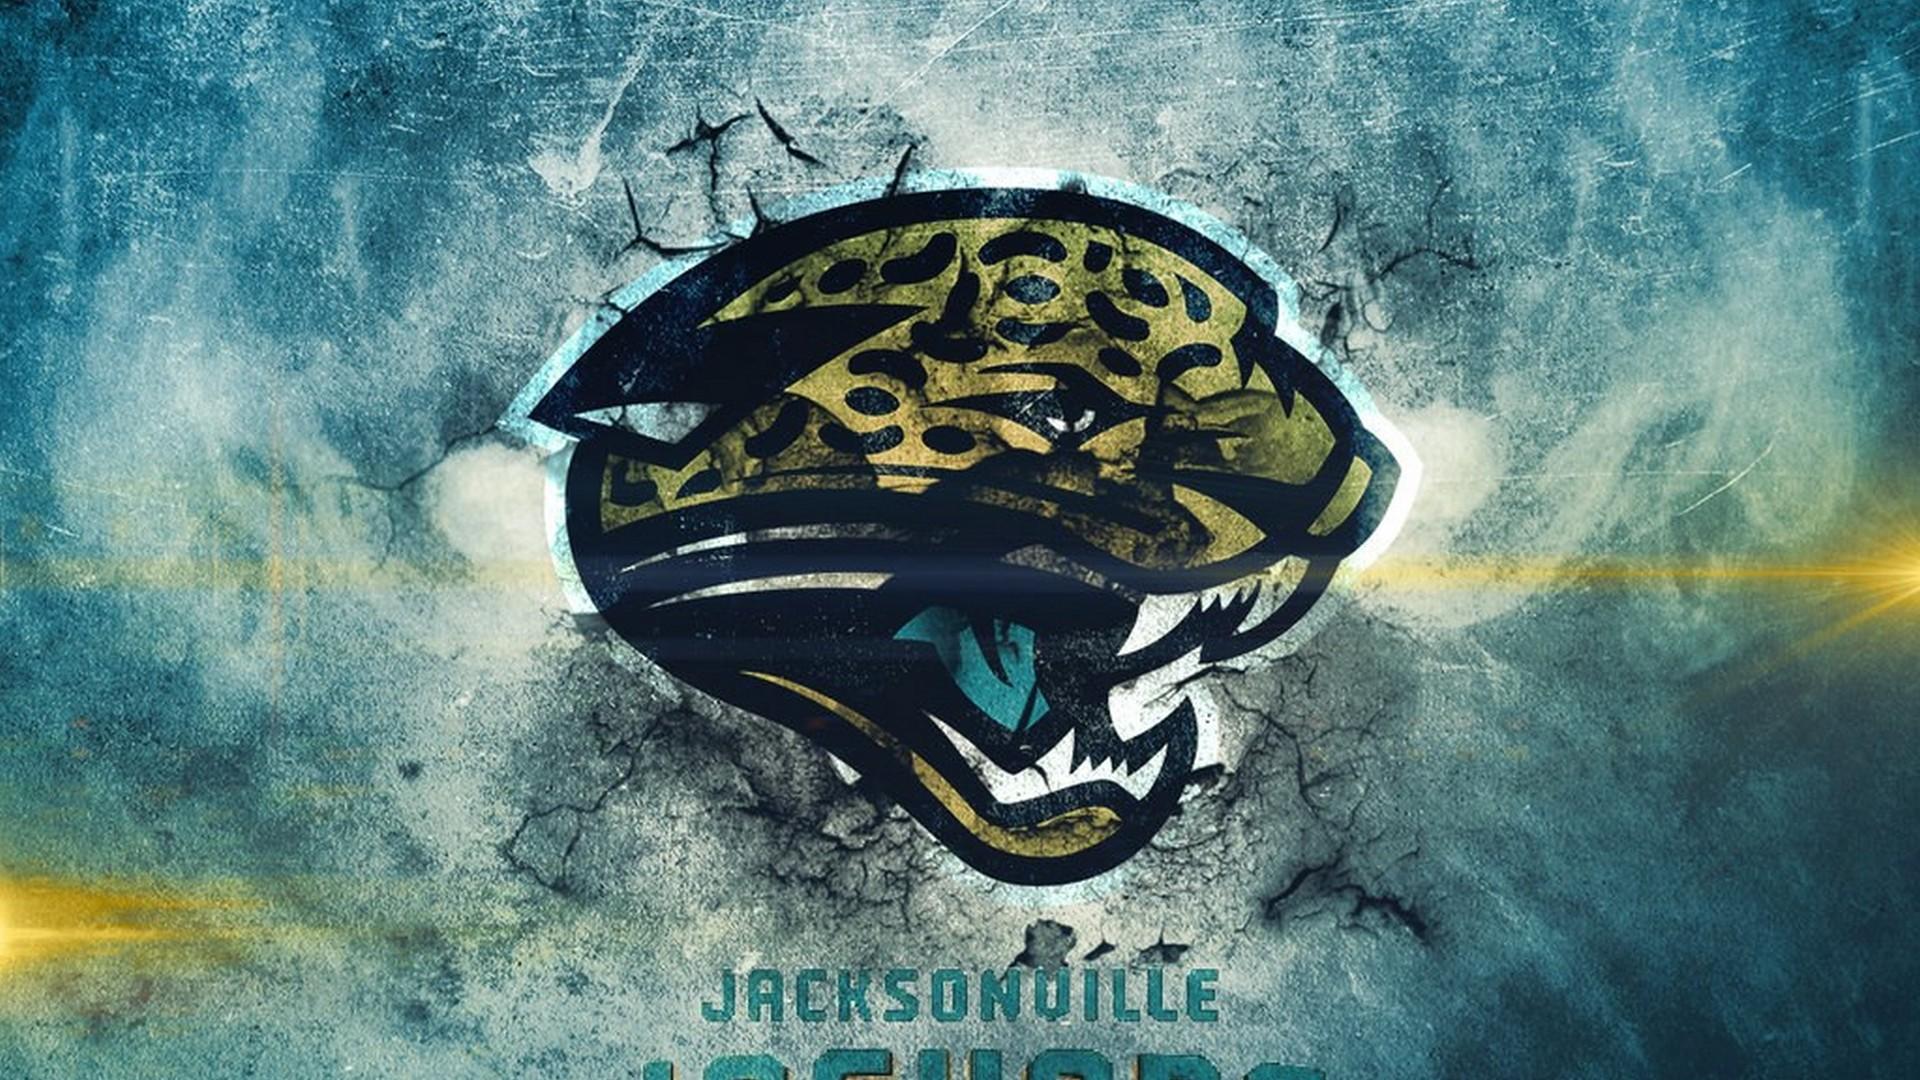 Jacksonville Jaguars Backgrounds HD 2019 NFL Football Wallpapers 1920x1080